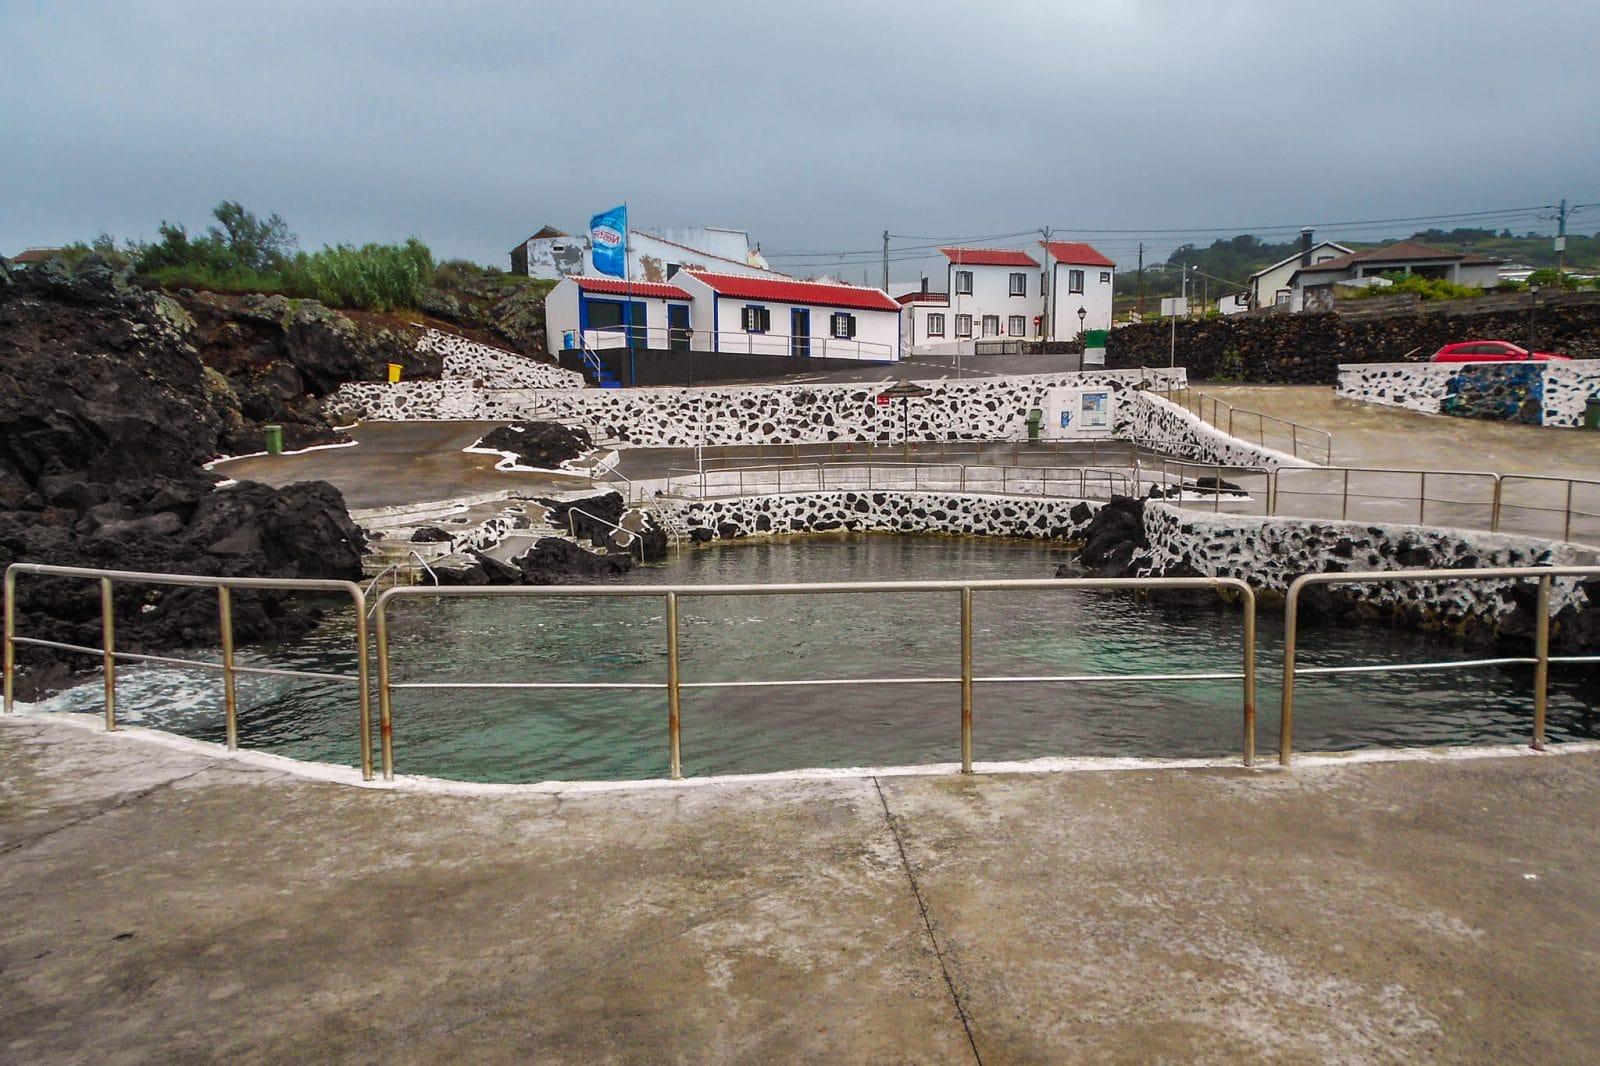 Бассейн Refugo (фото: tmarques17)